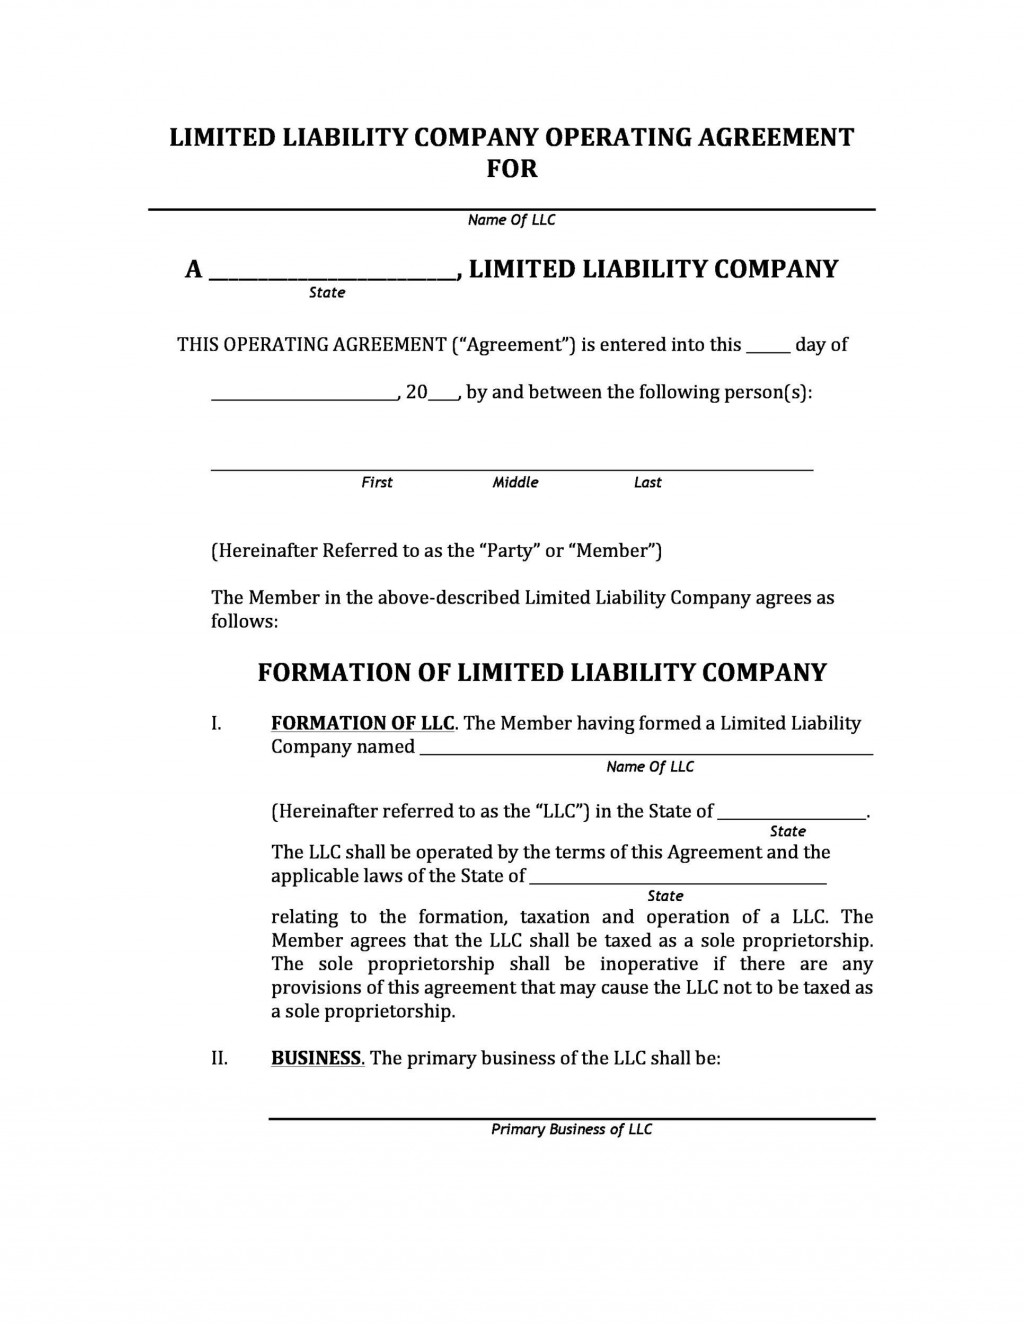 005 Top Operation Agreement Llc Template High Resolution  Operating Florida Indiana Single Member CaliforniaLarge